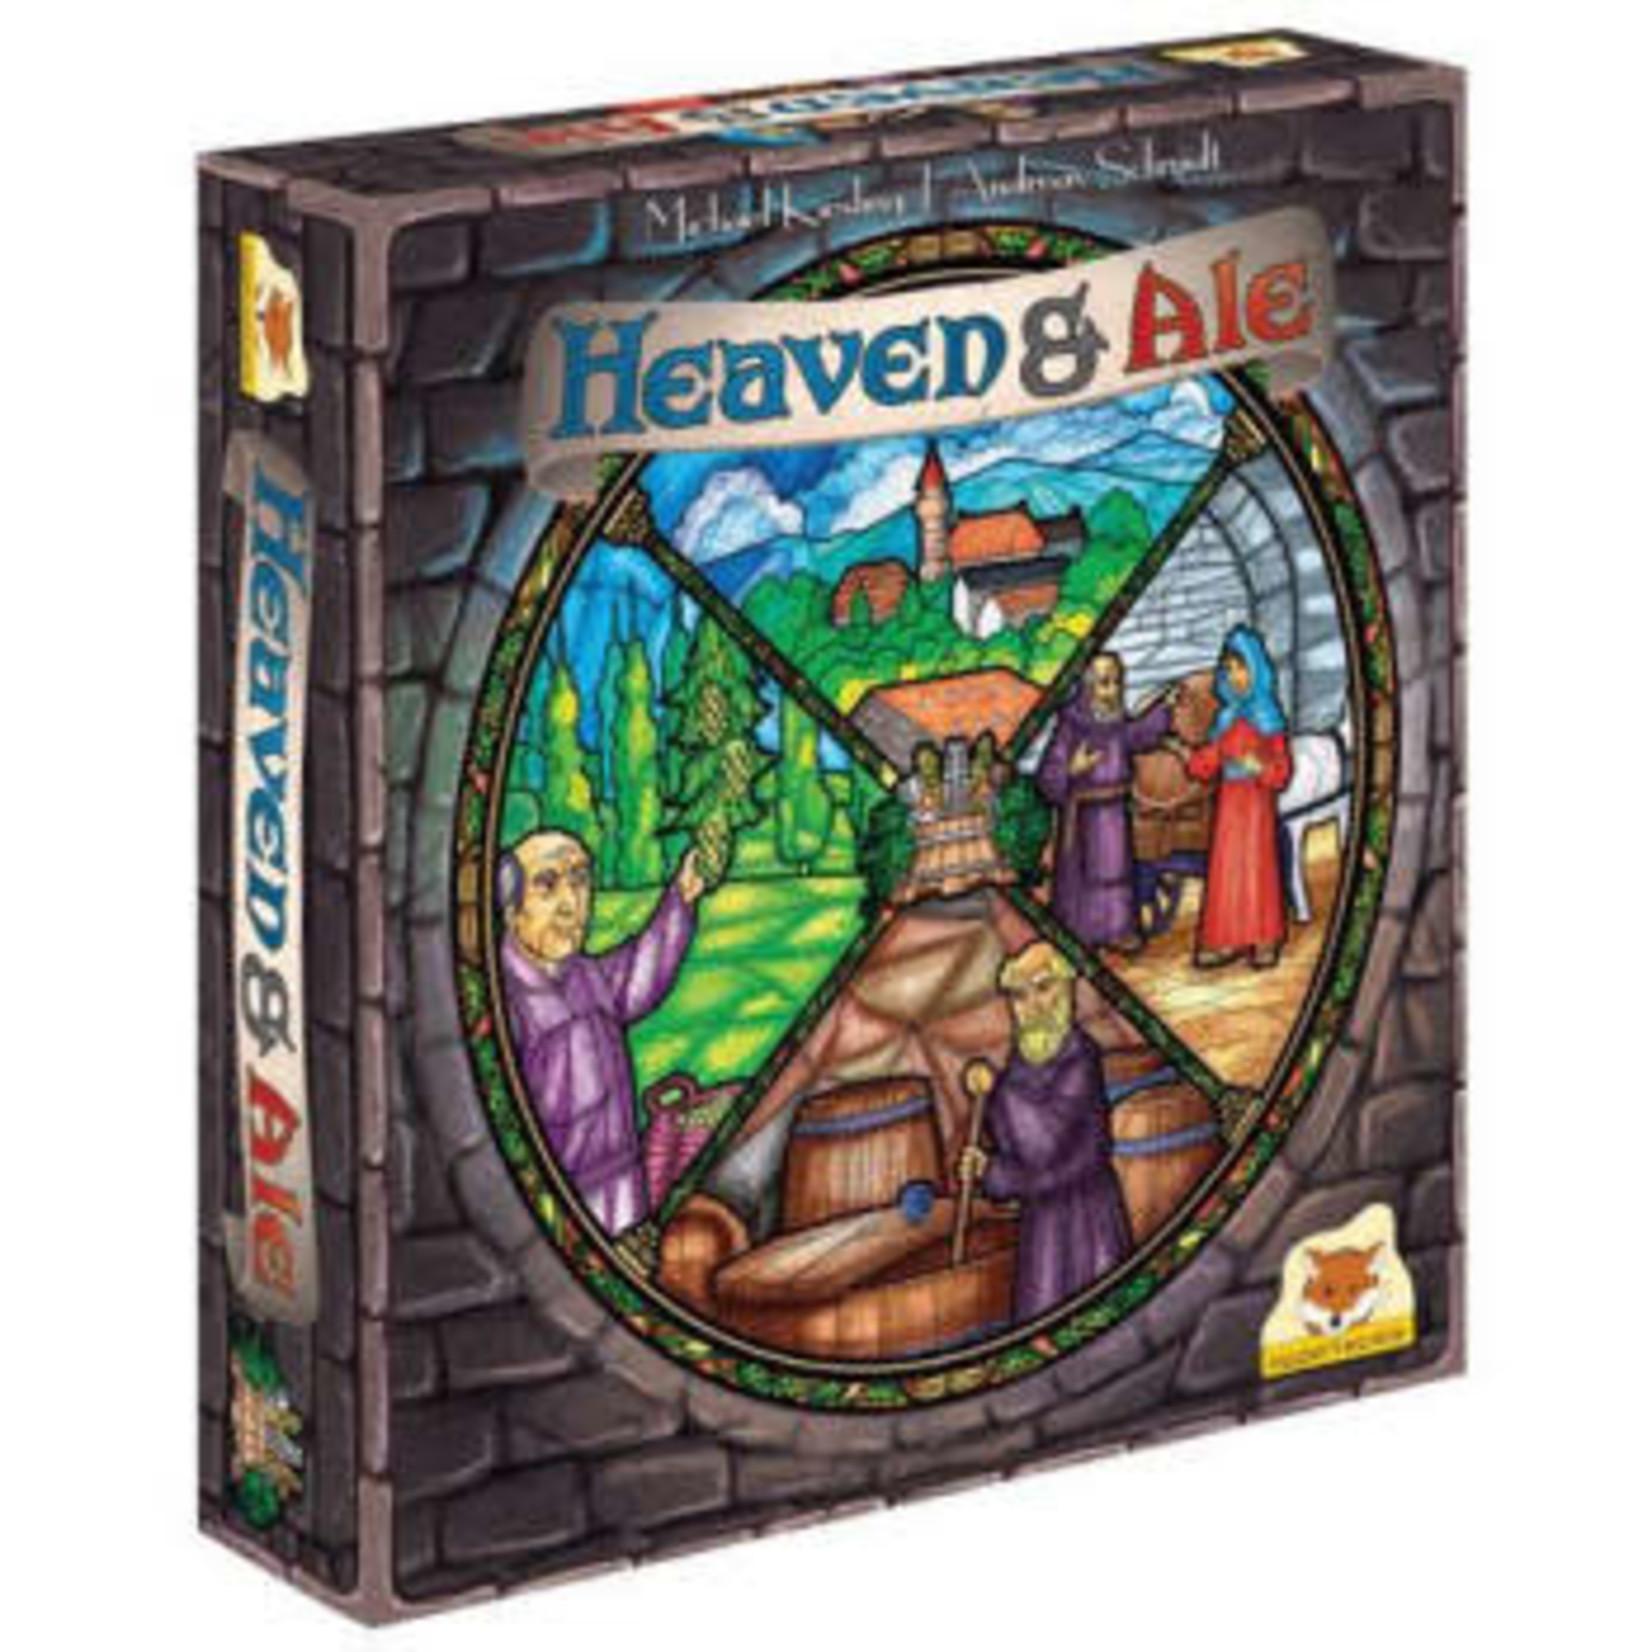 eggertspiele Heaven and Ale